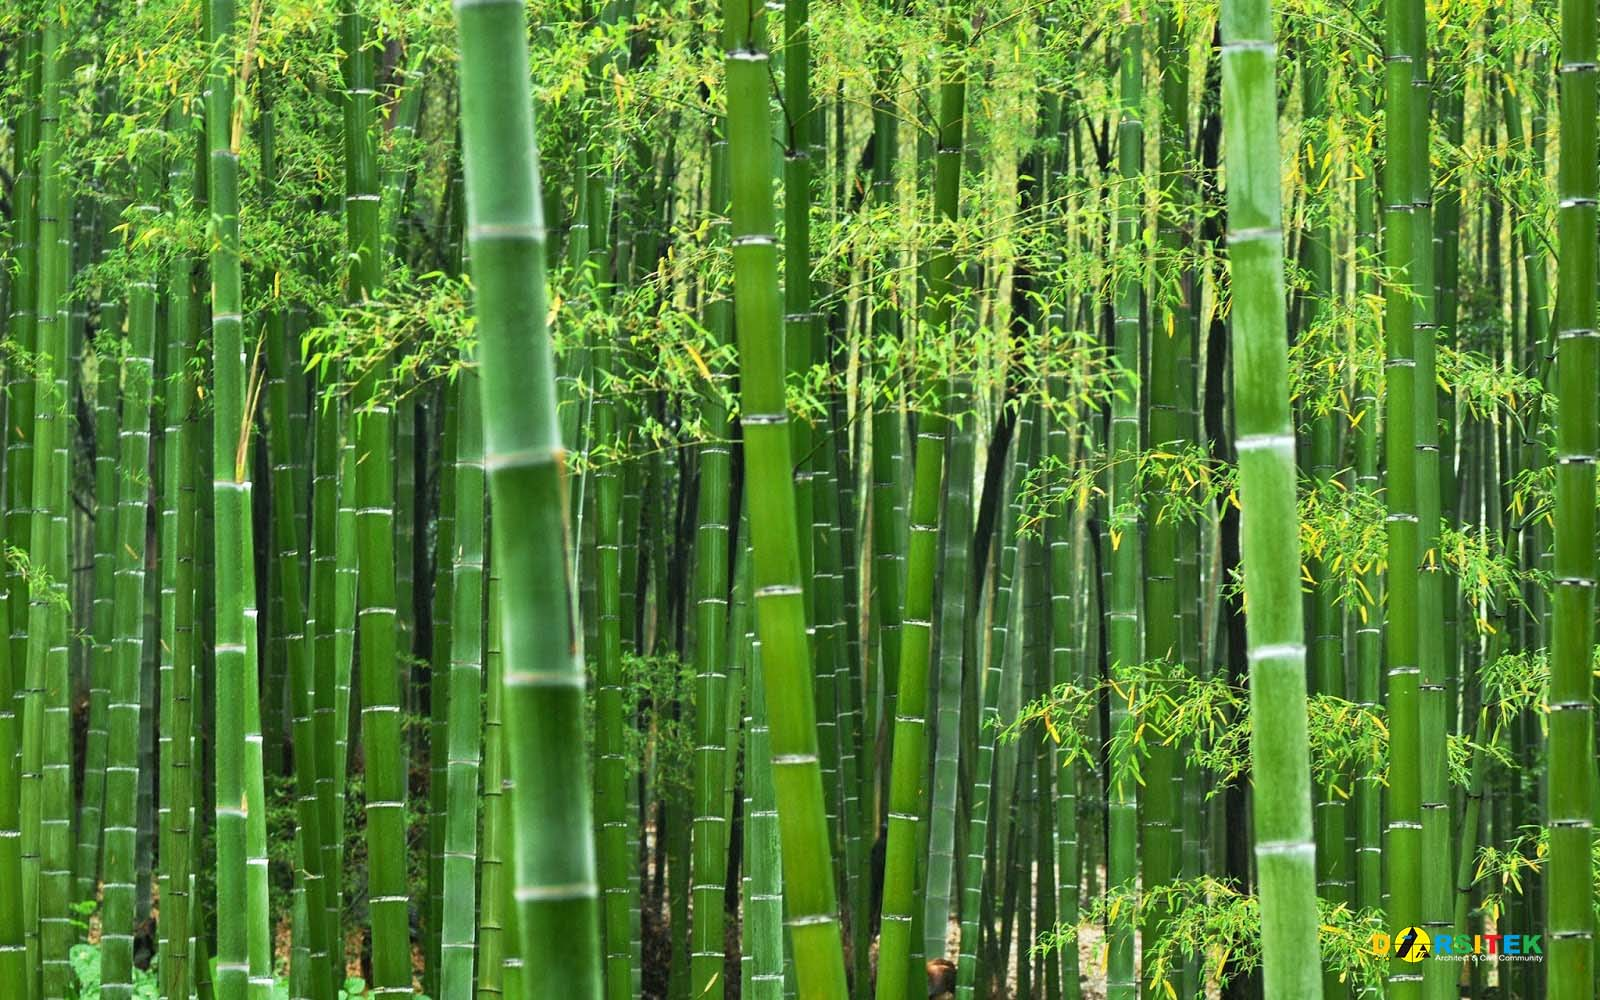 struktur bambu